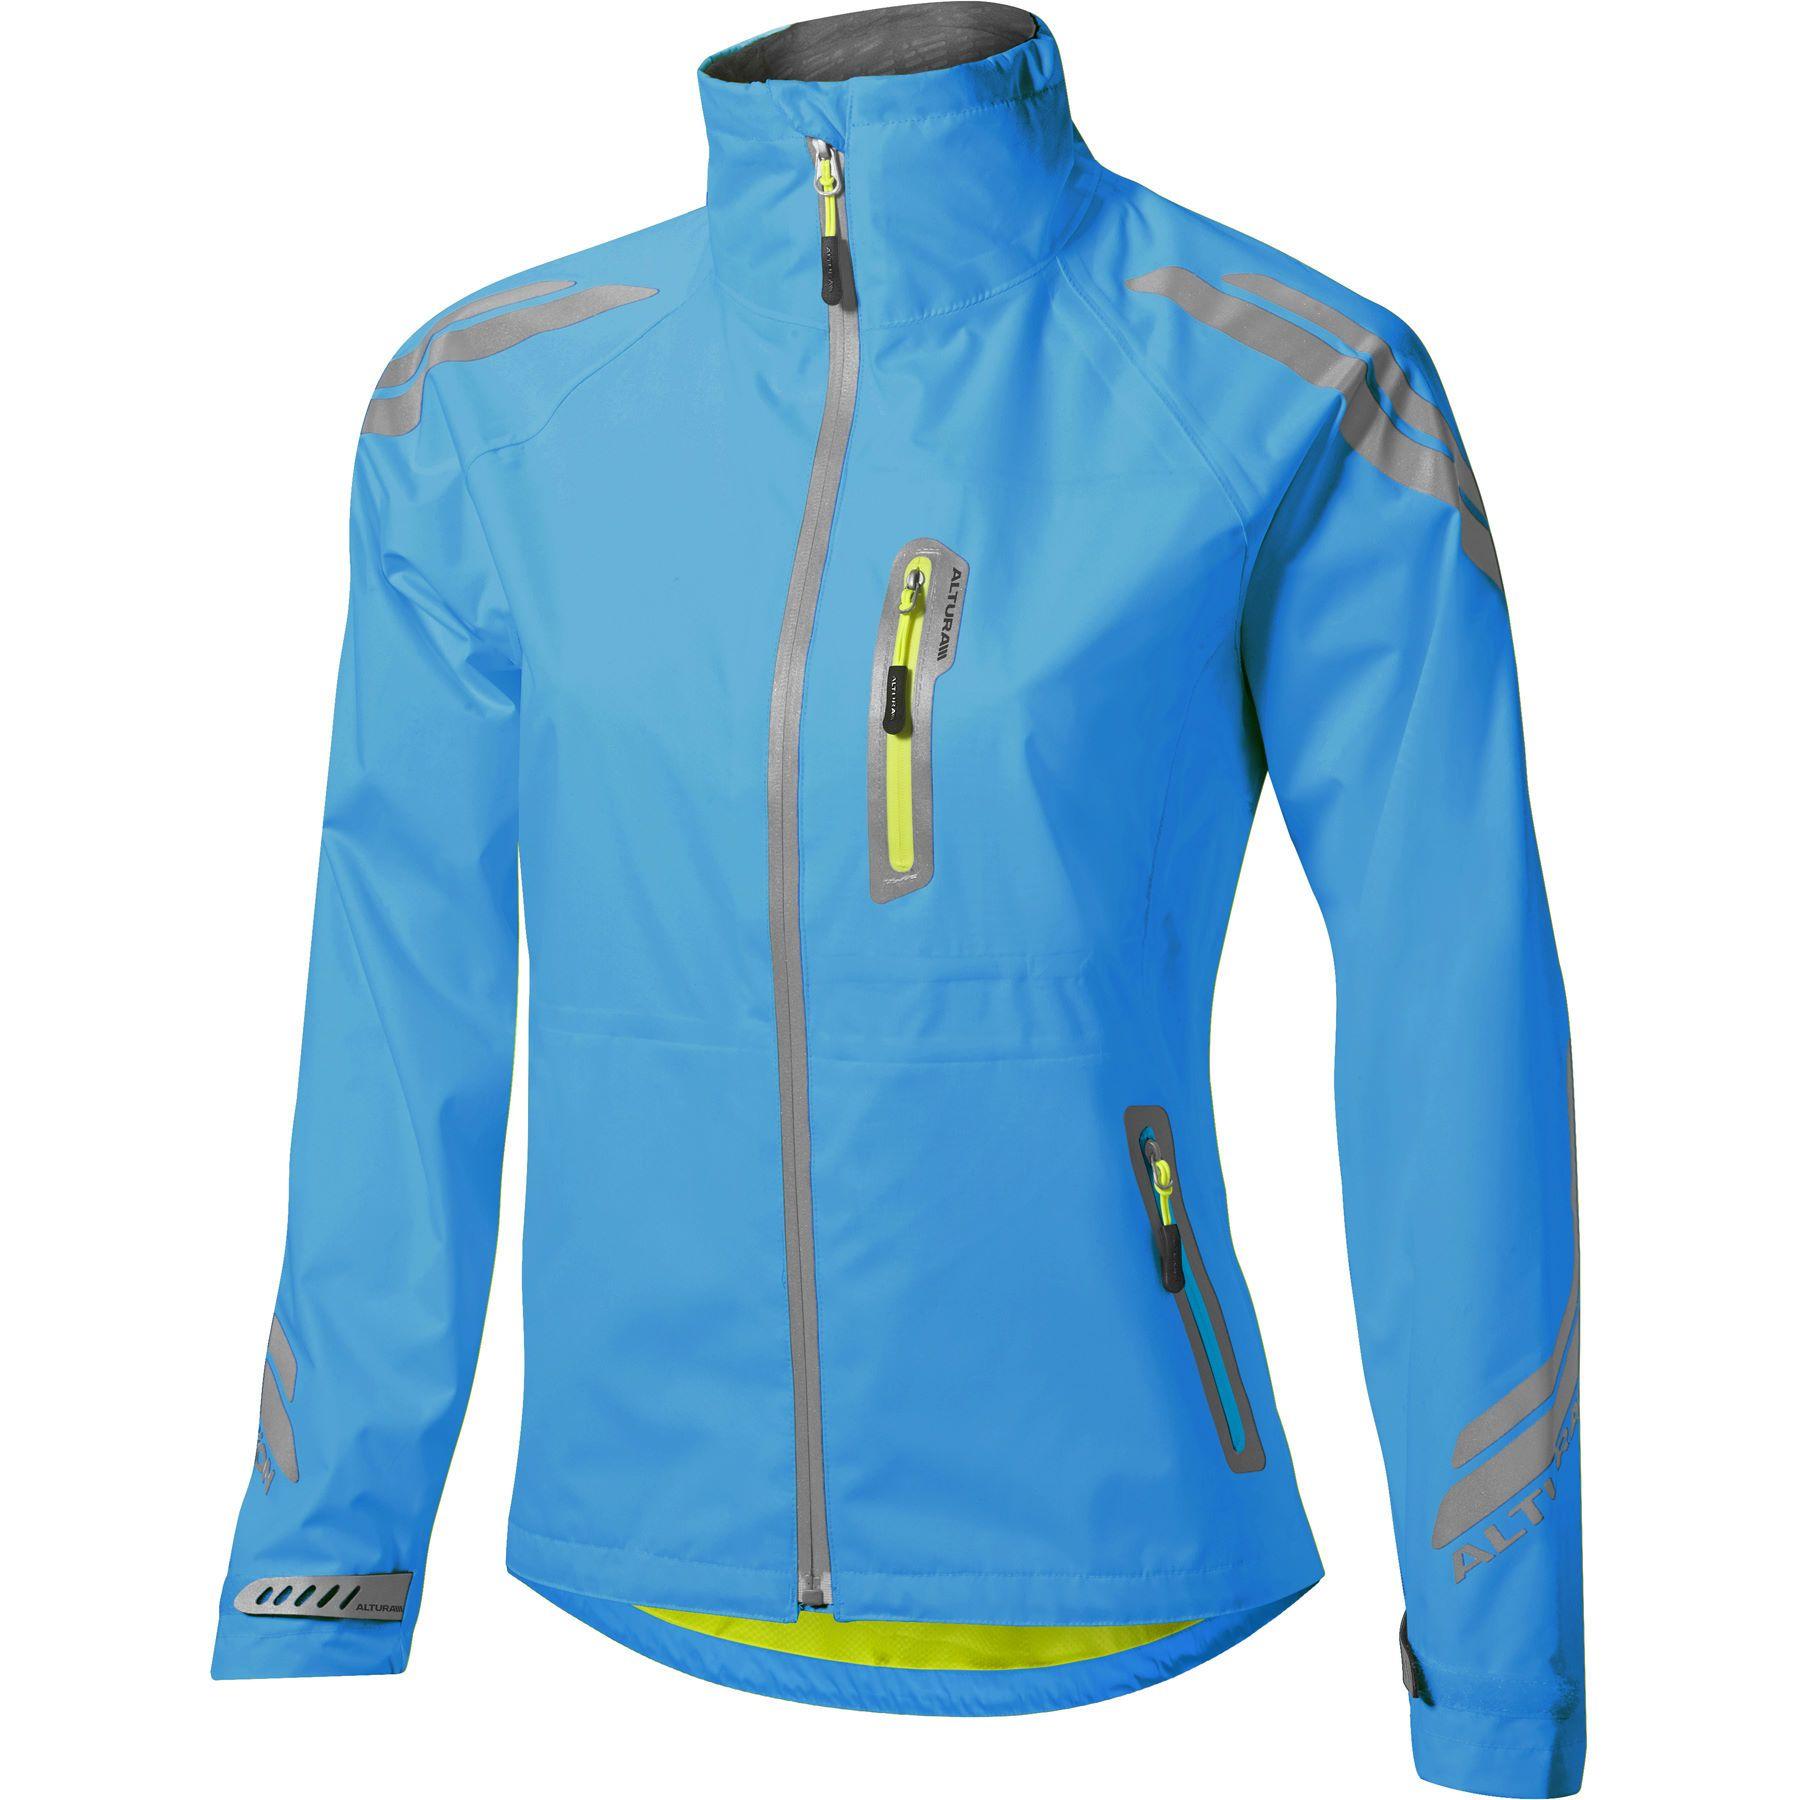 Women'S Waterproof Running Jacket | Jackets Review